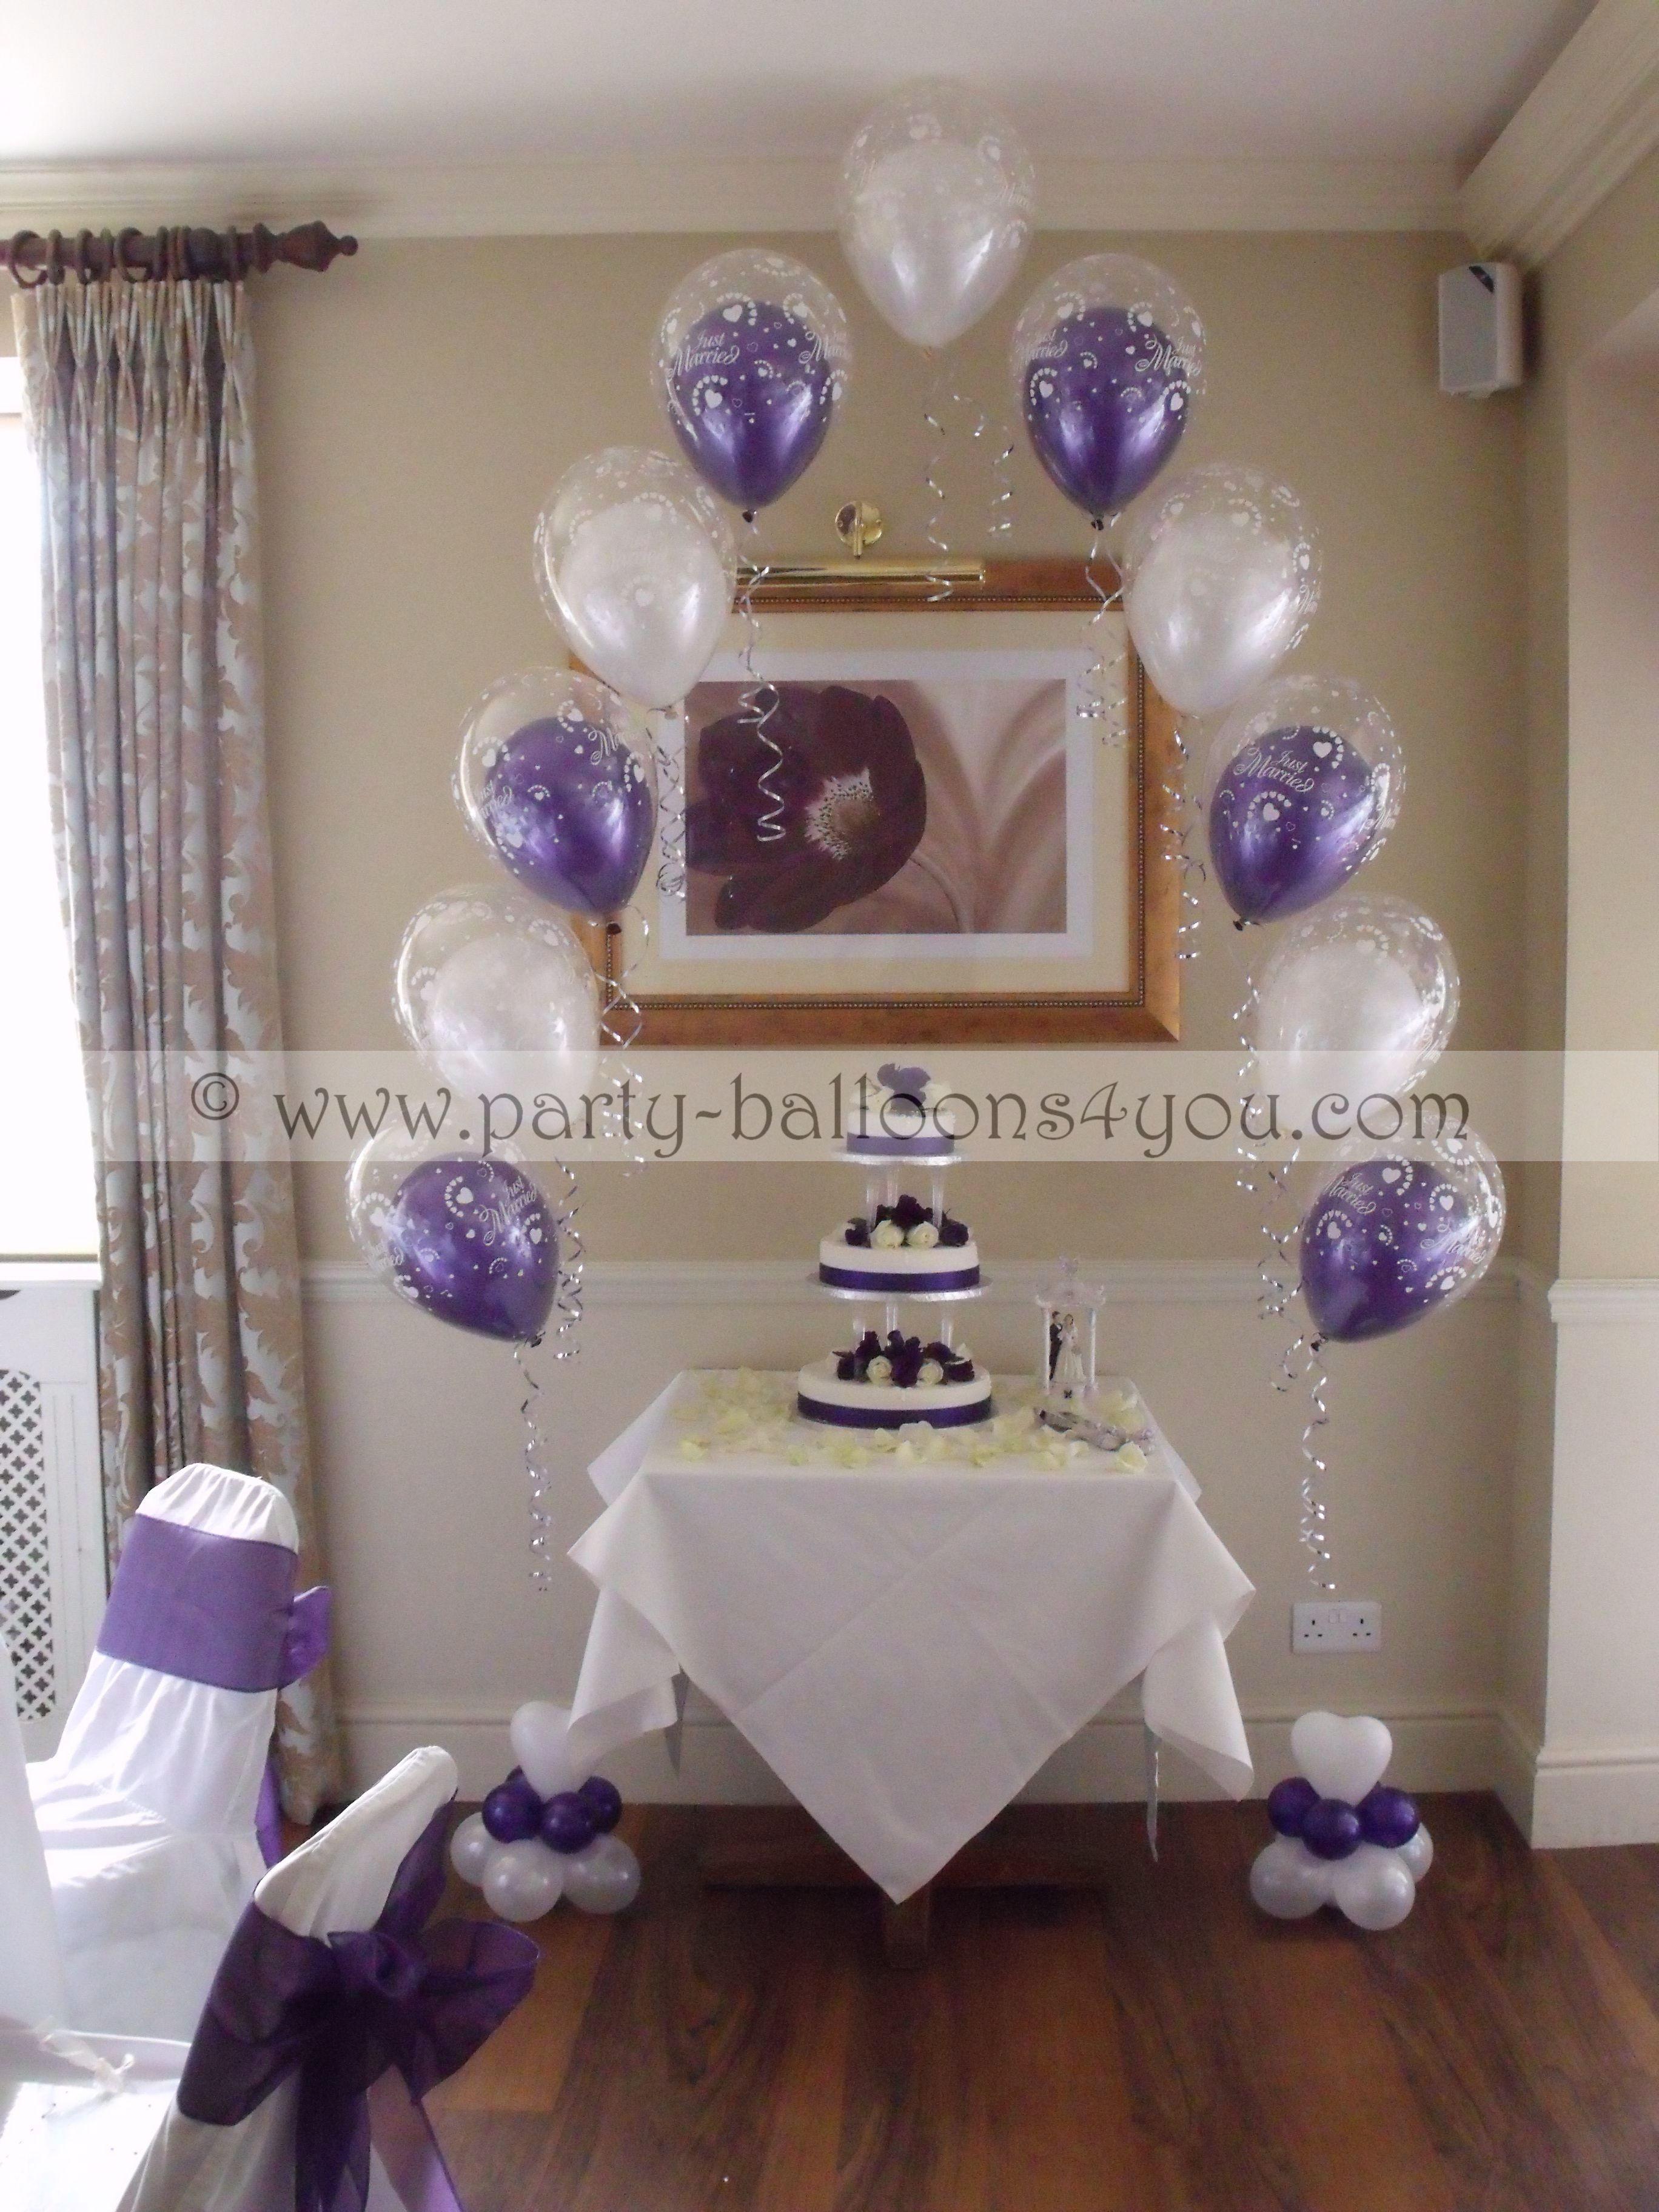 242320f21133e0ea277ca004a1430a50 Jpg 2736 3648 Wedding Balloon Decorations Wedding Balloons Wedding Cake Table